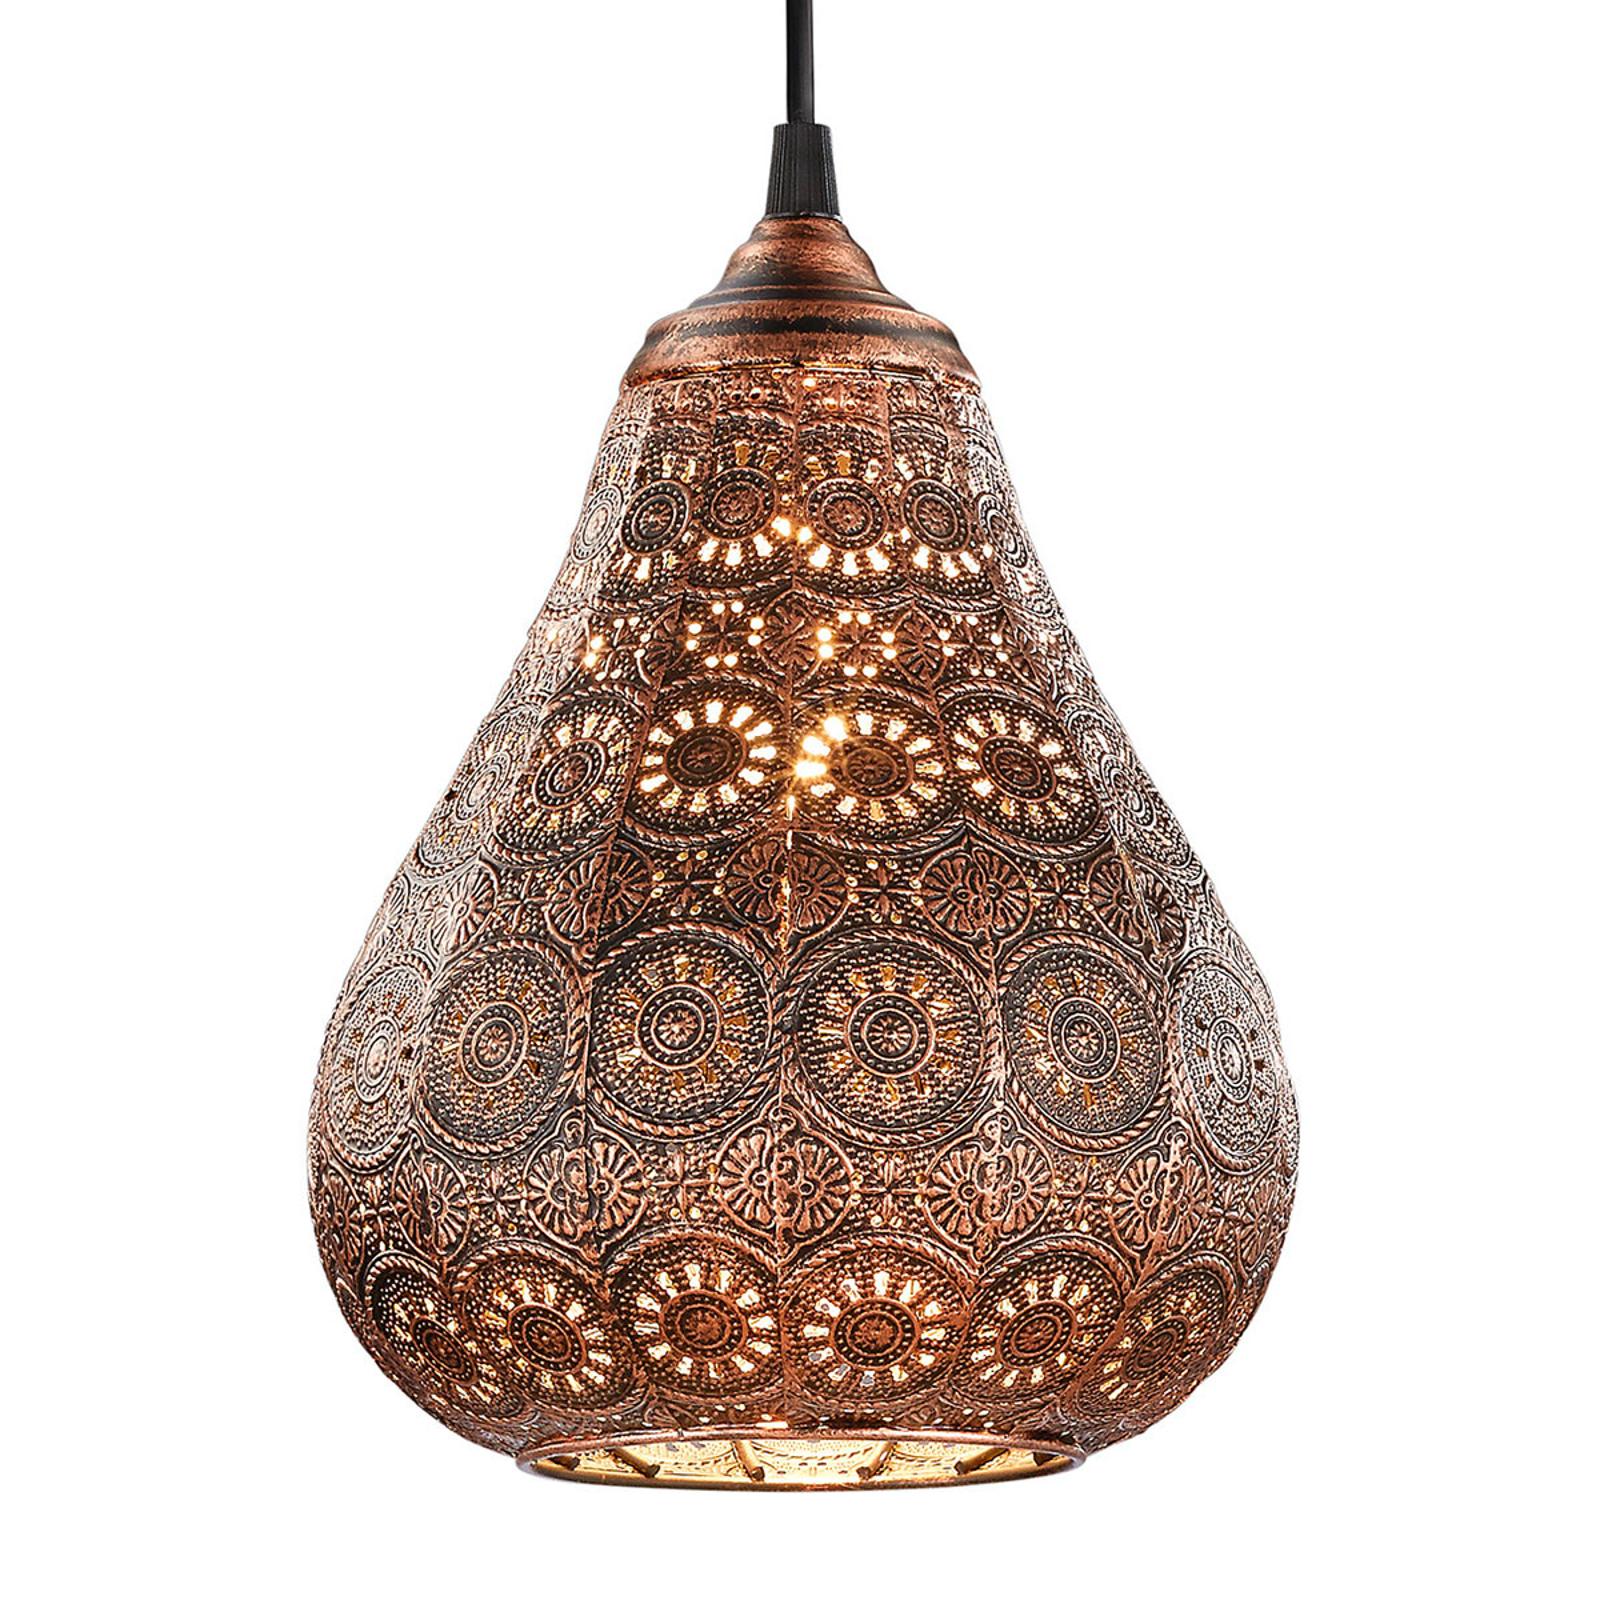 Kolor miedzi – lampa wisząca Jasmin